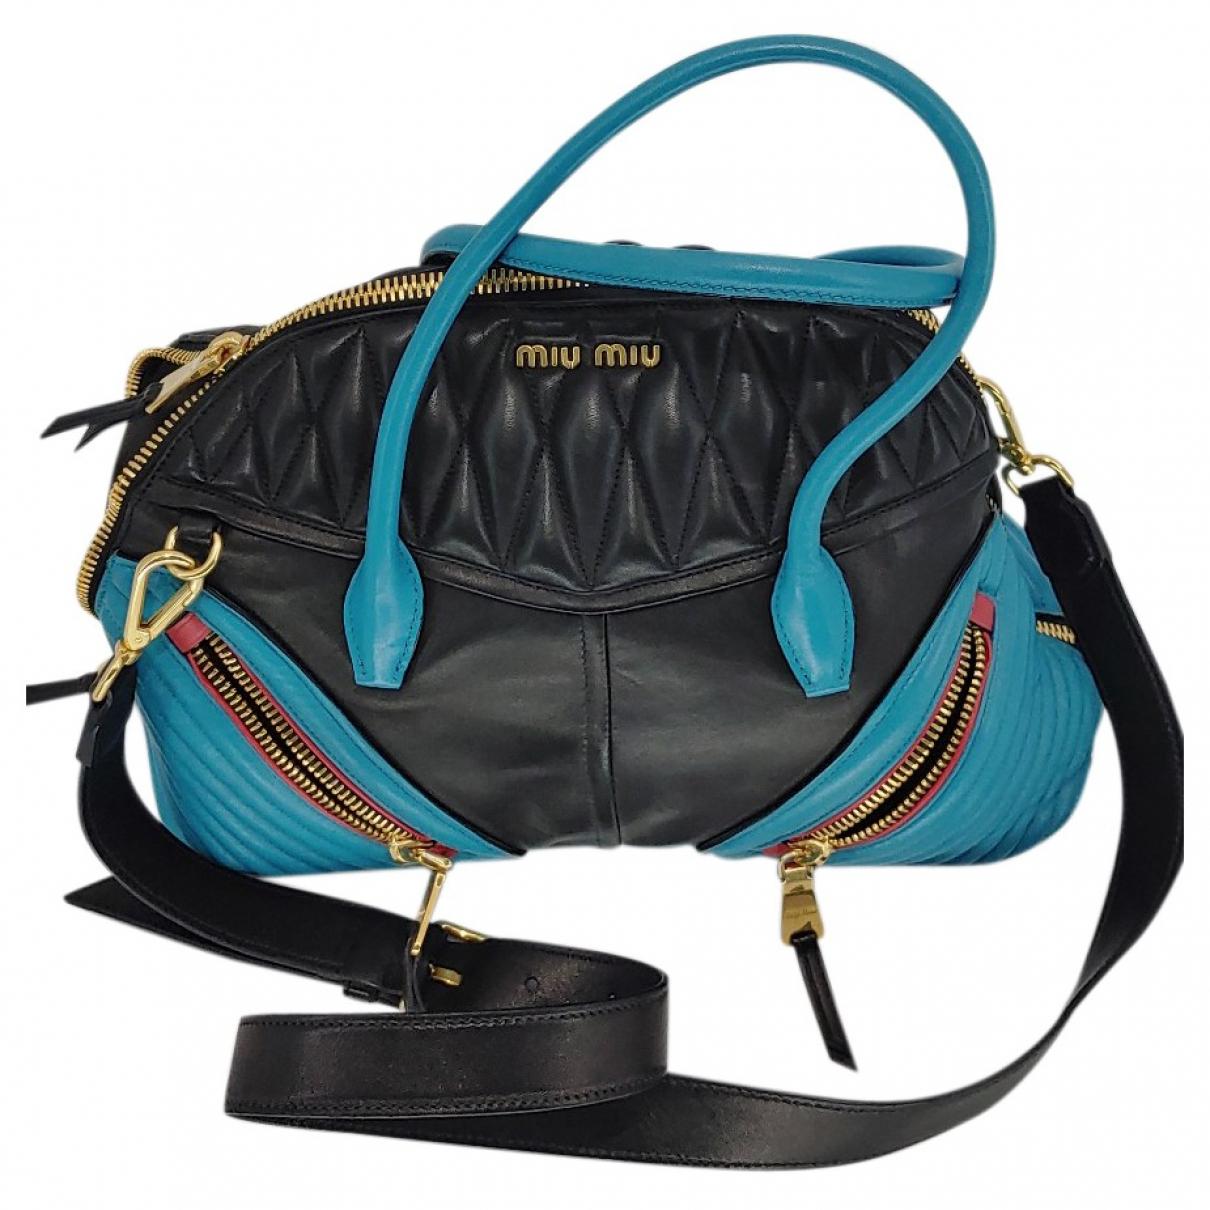 Miu Miu \N Turquoise Leather handbag for Women \N